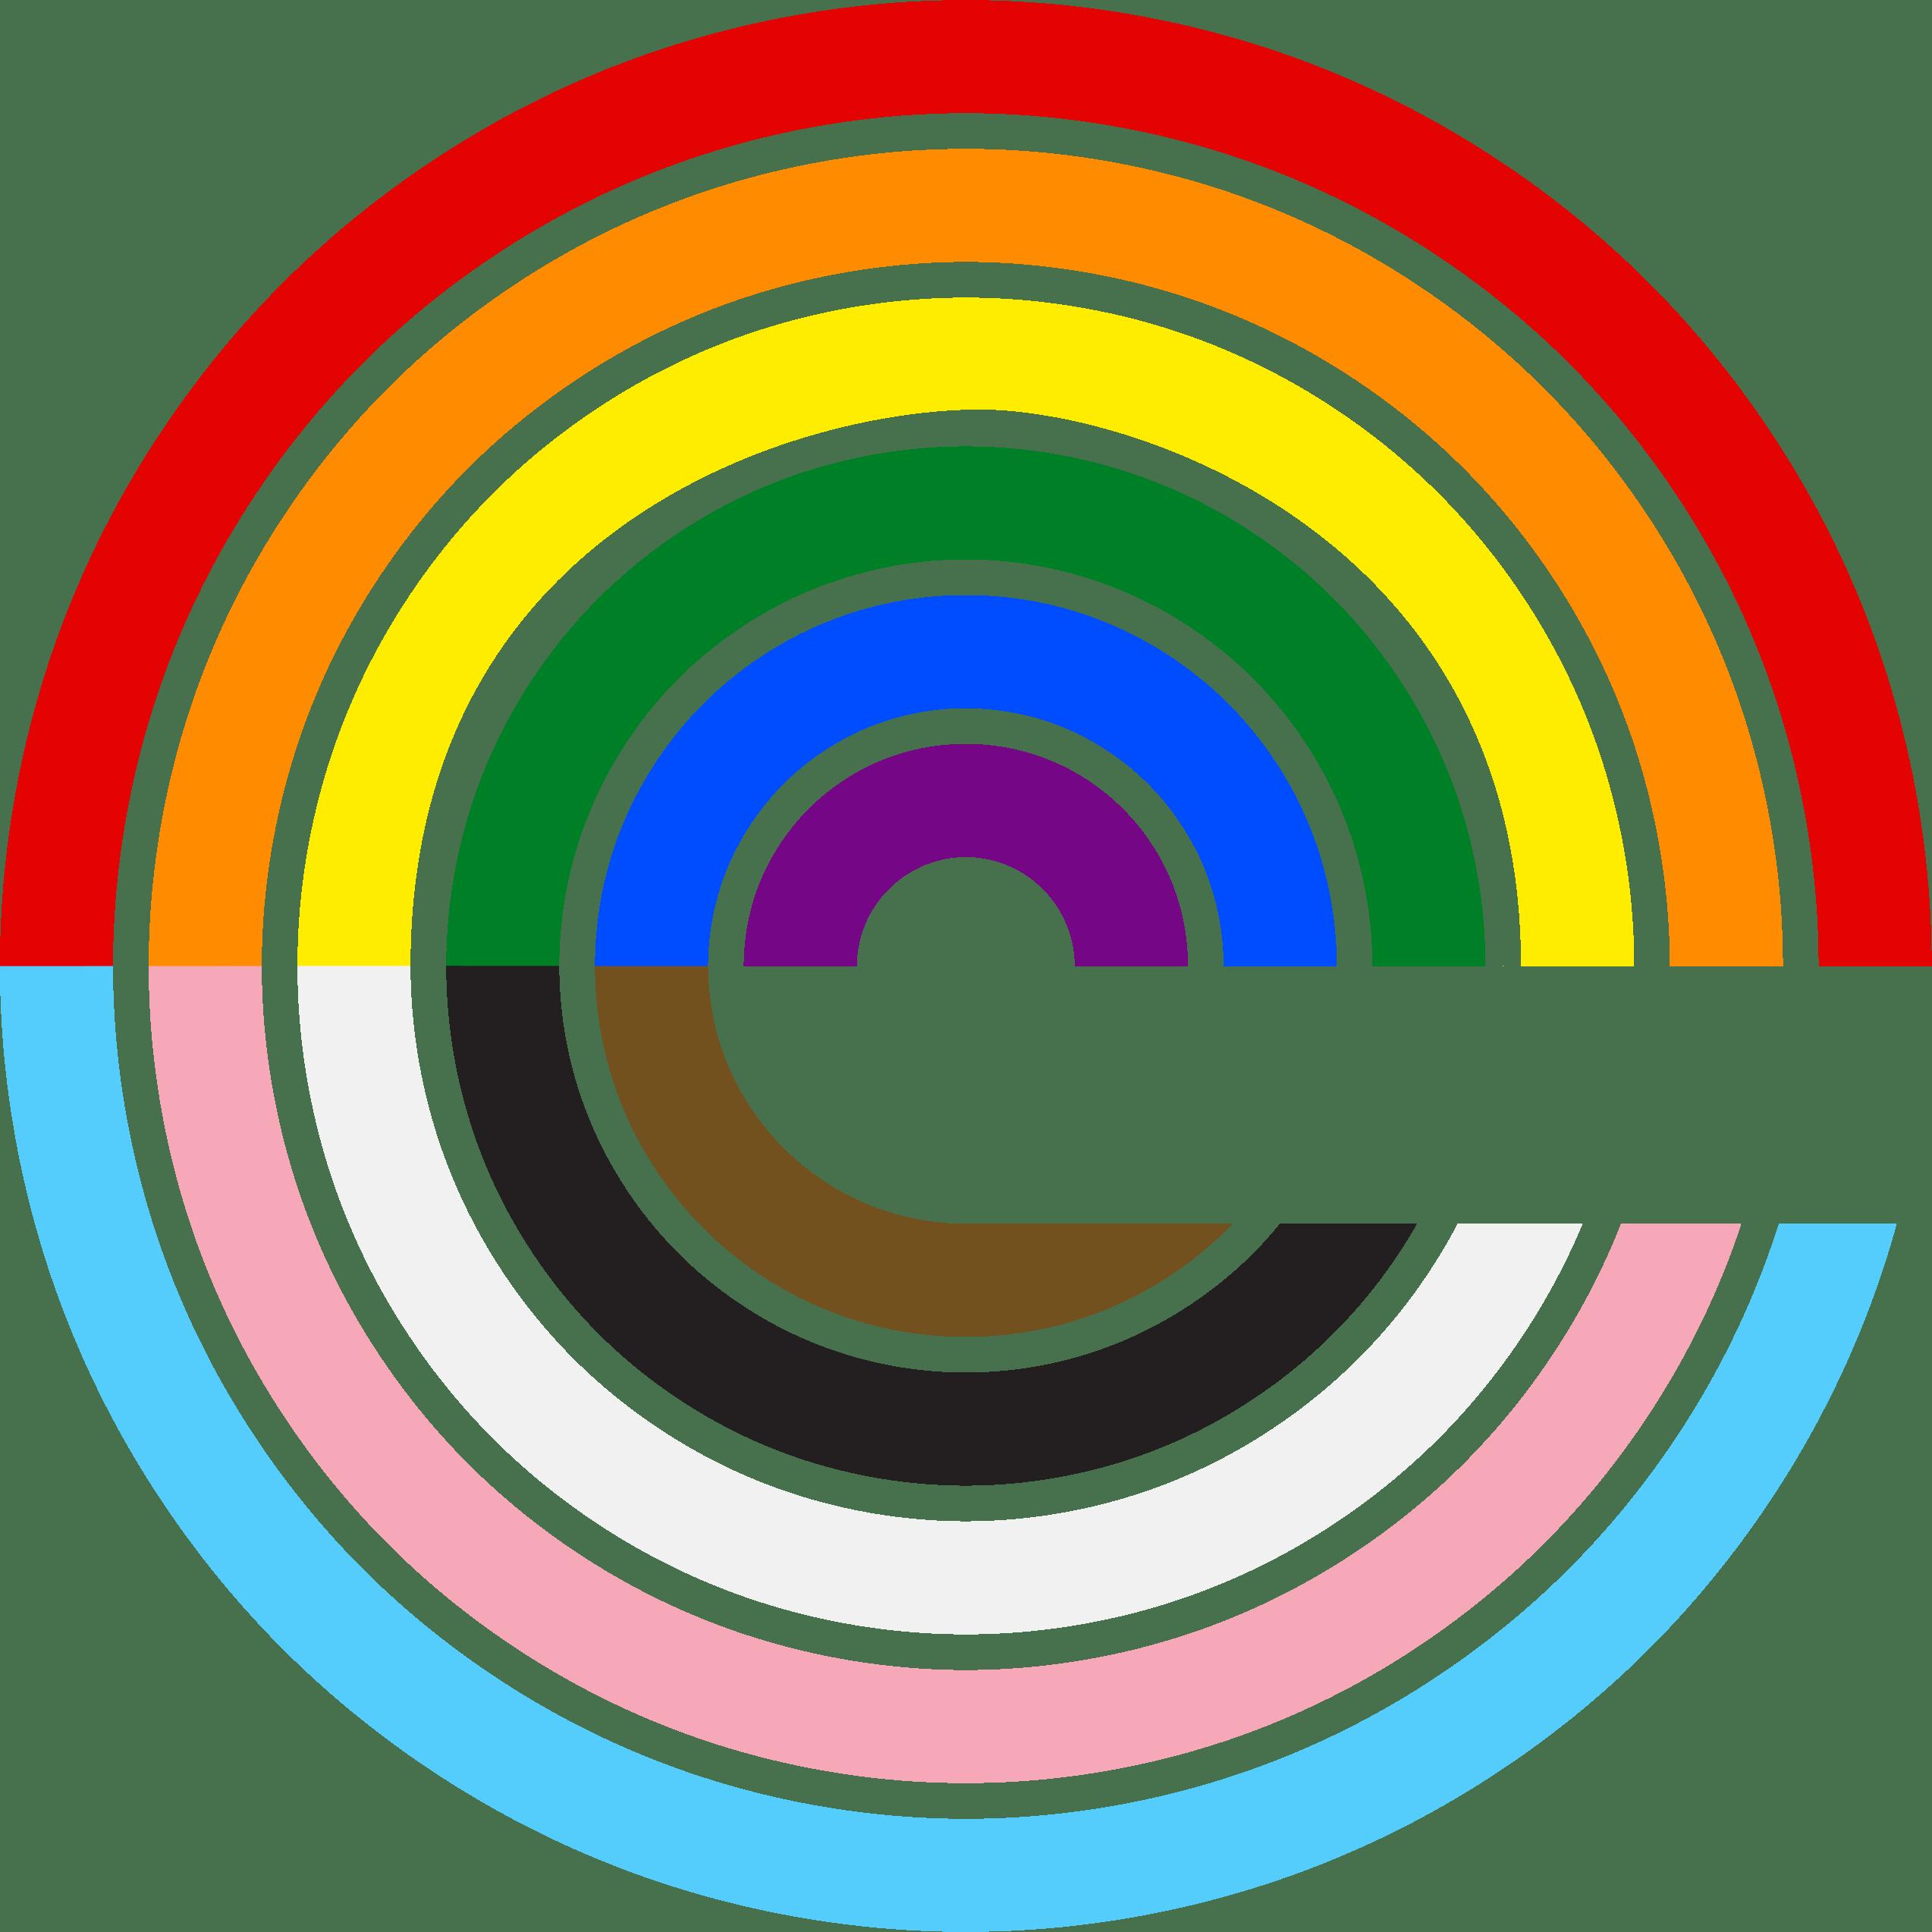 pride-rainbow-icon.png